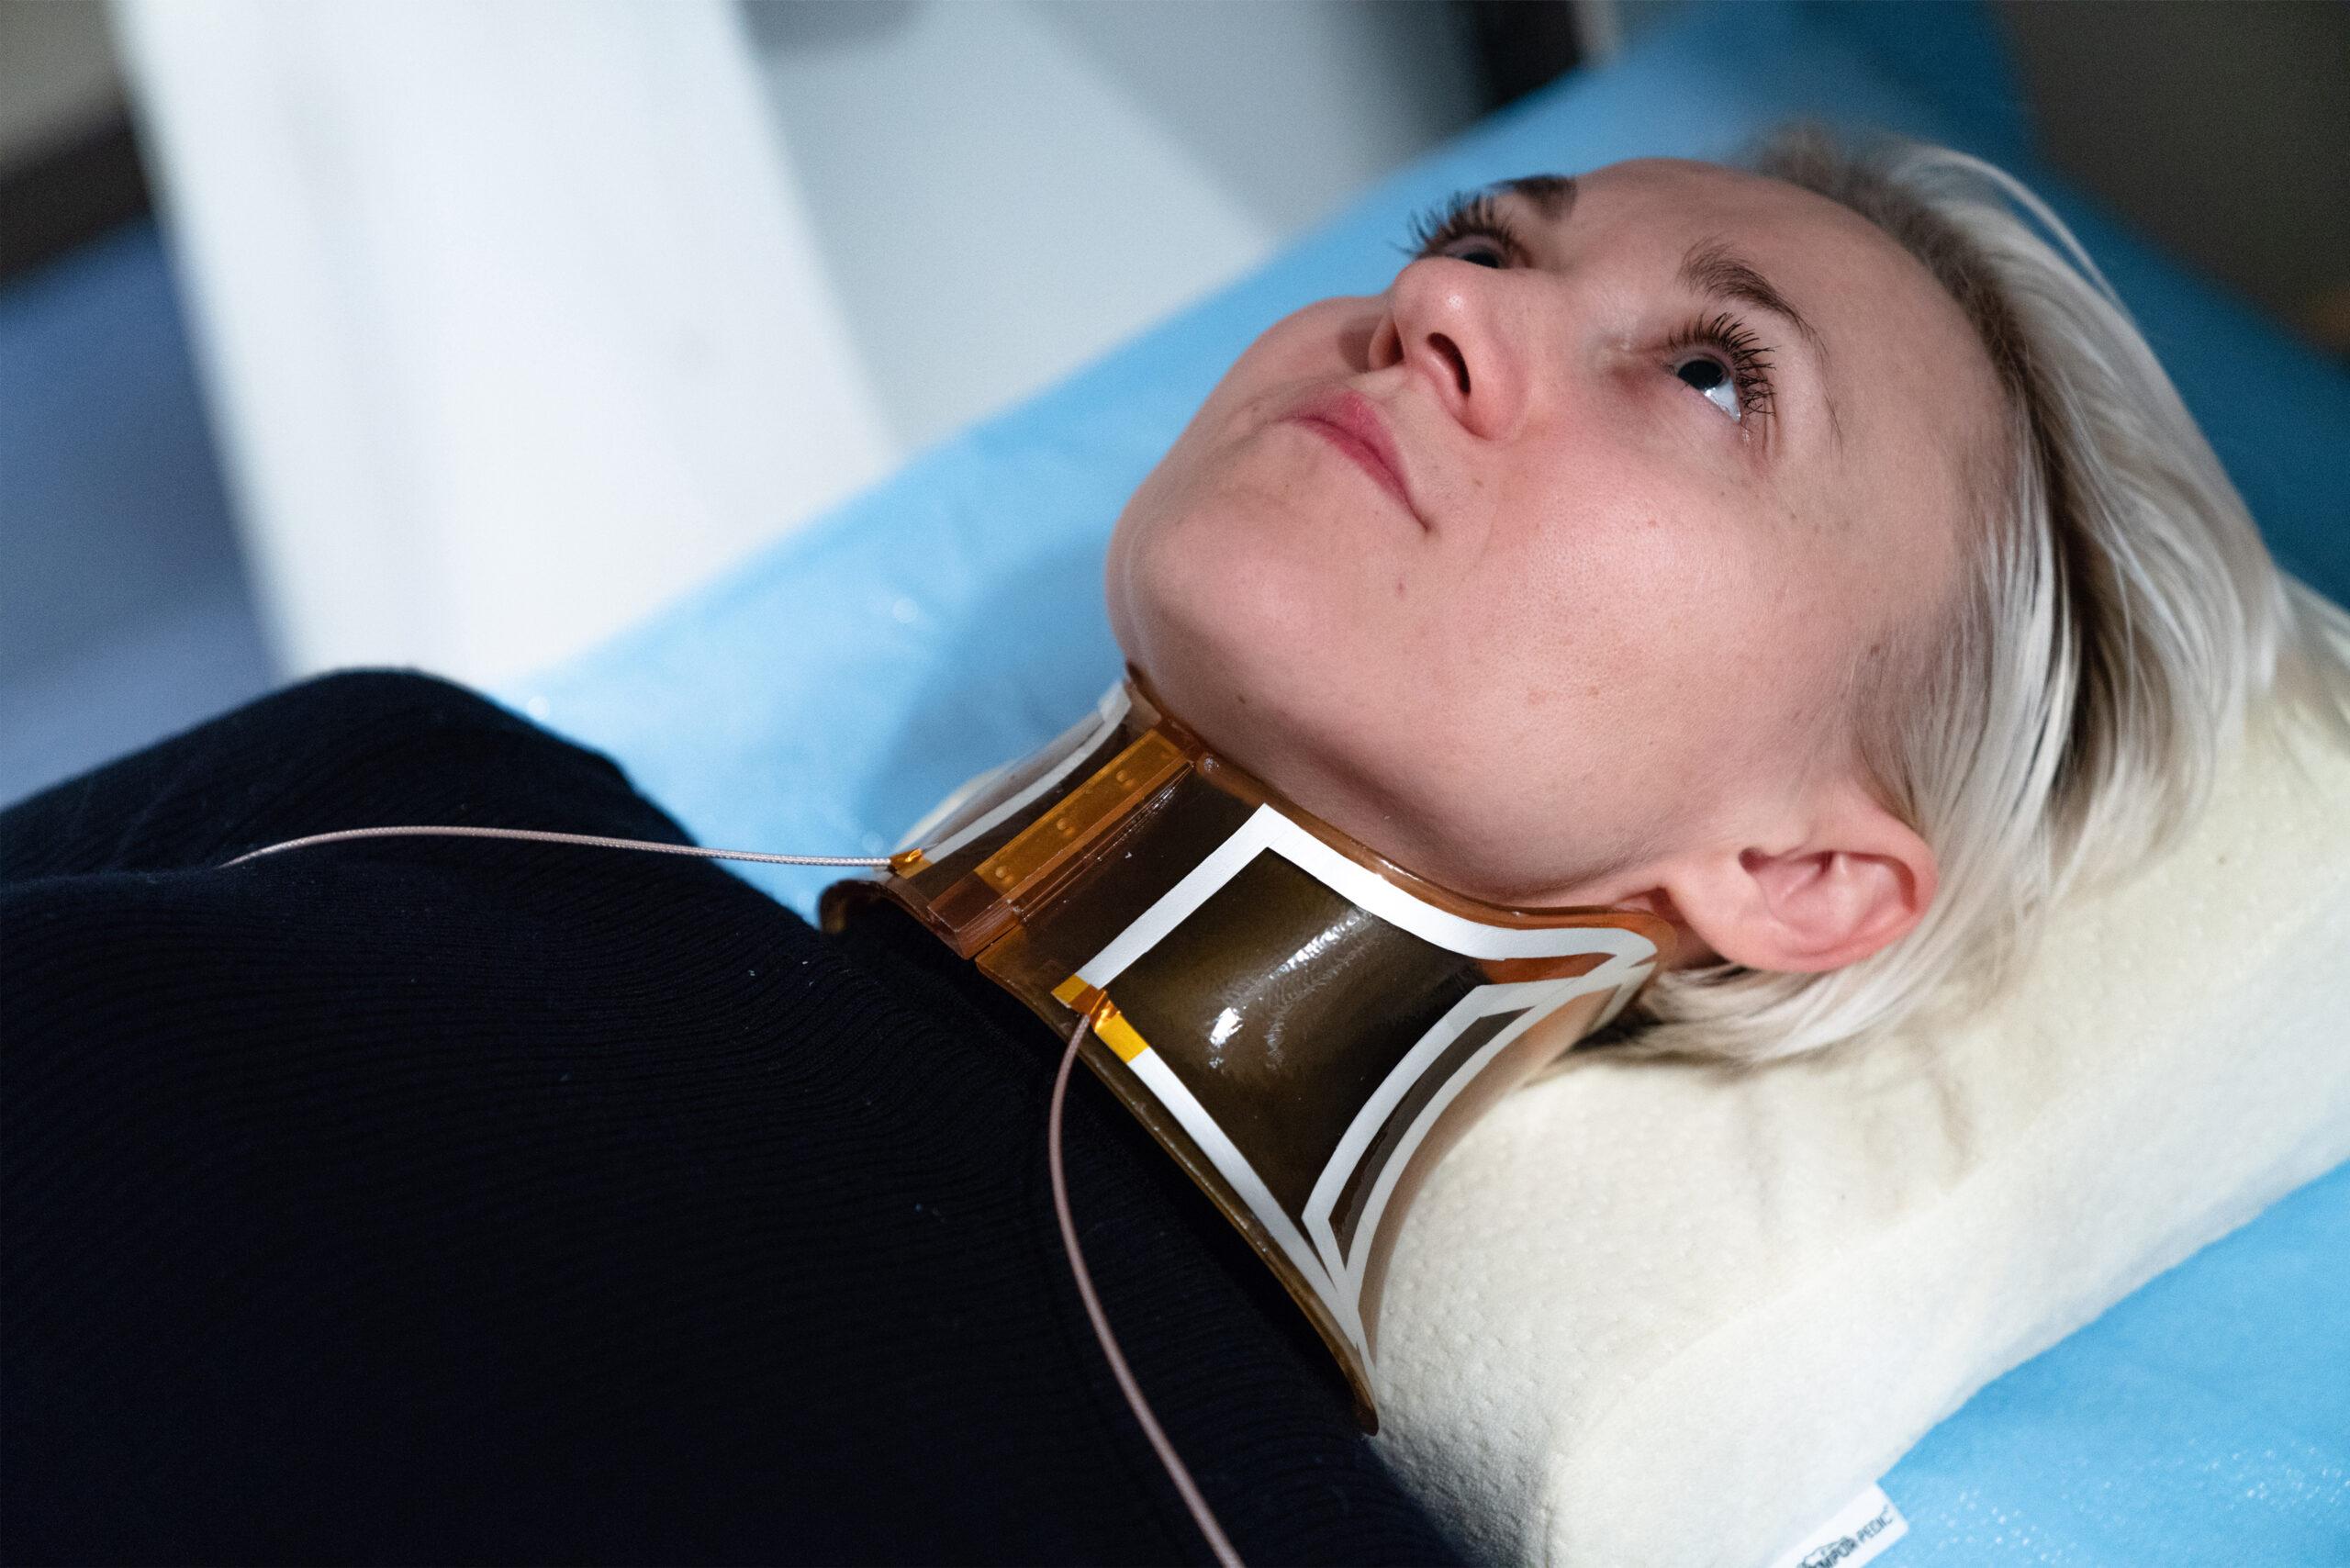 UC Berkeley: Customized MRI Neck Coil